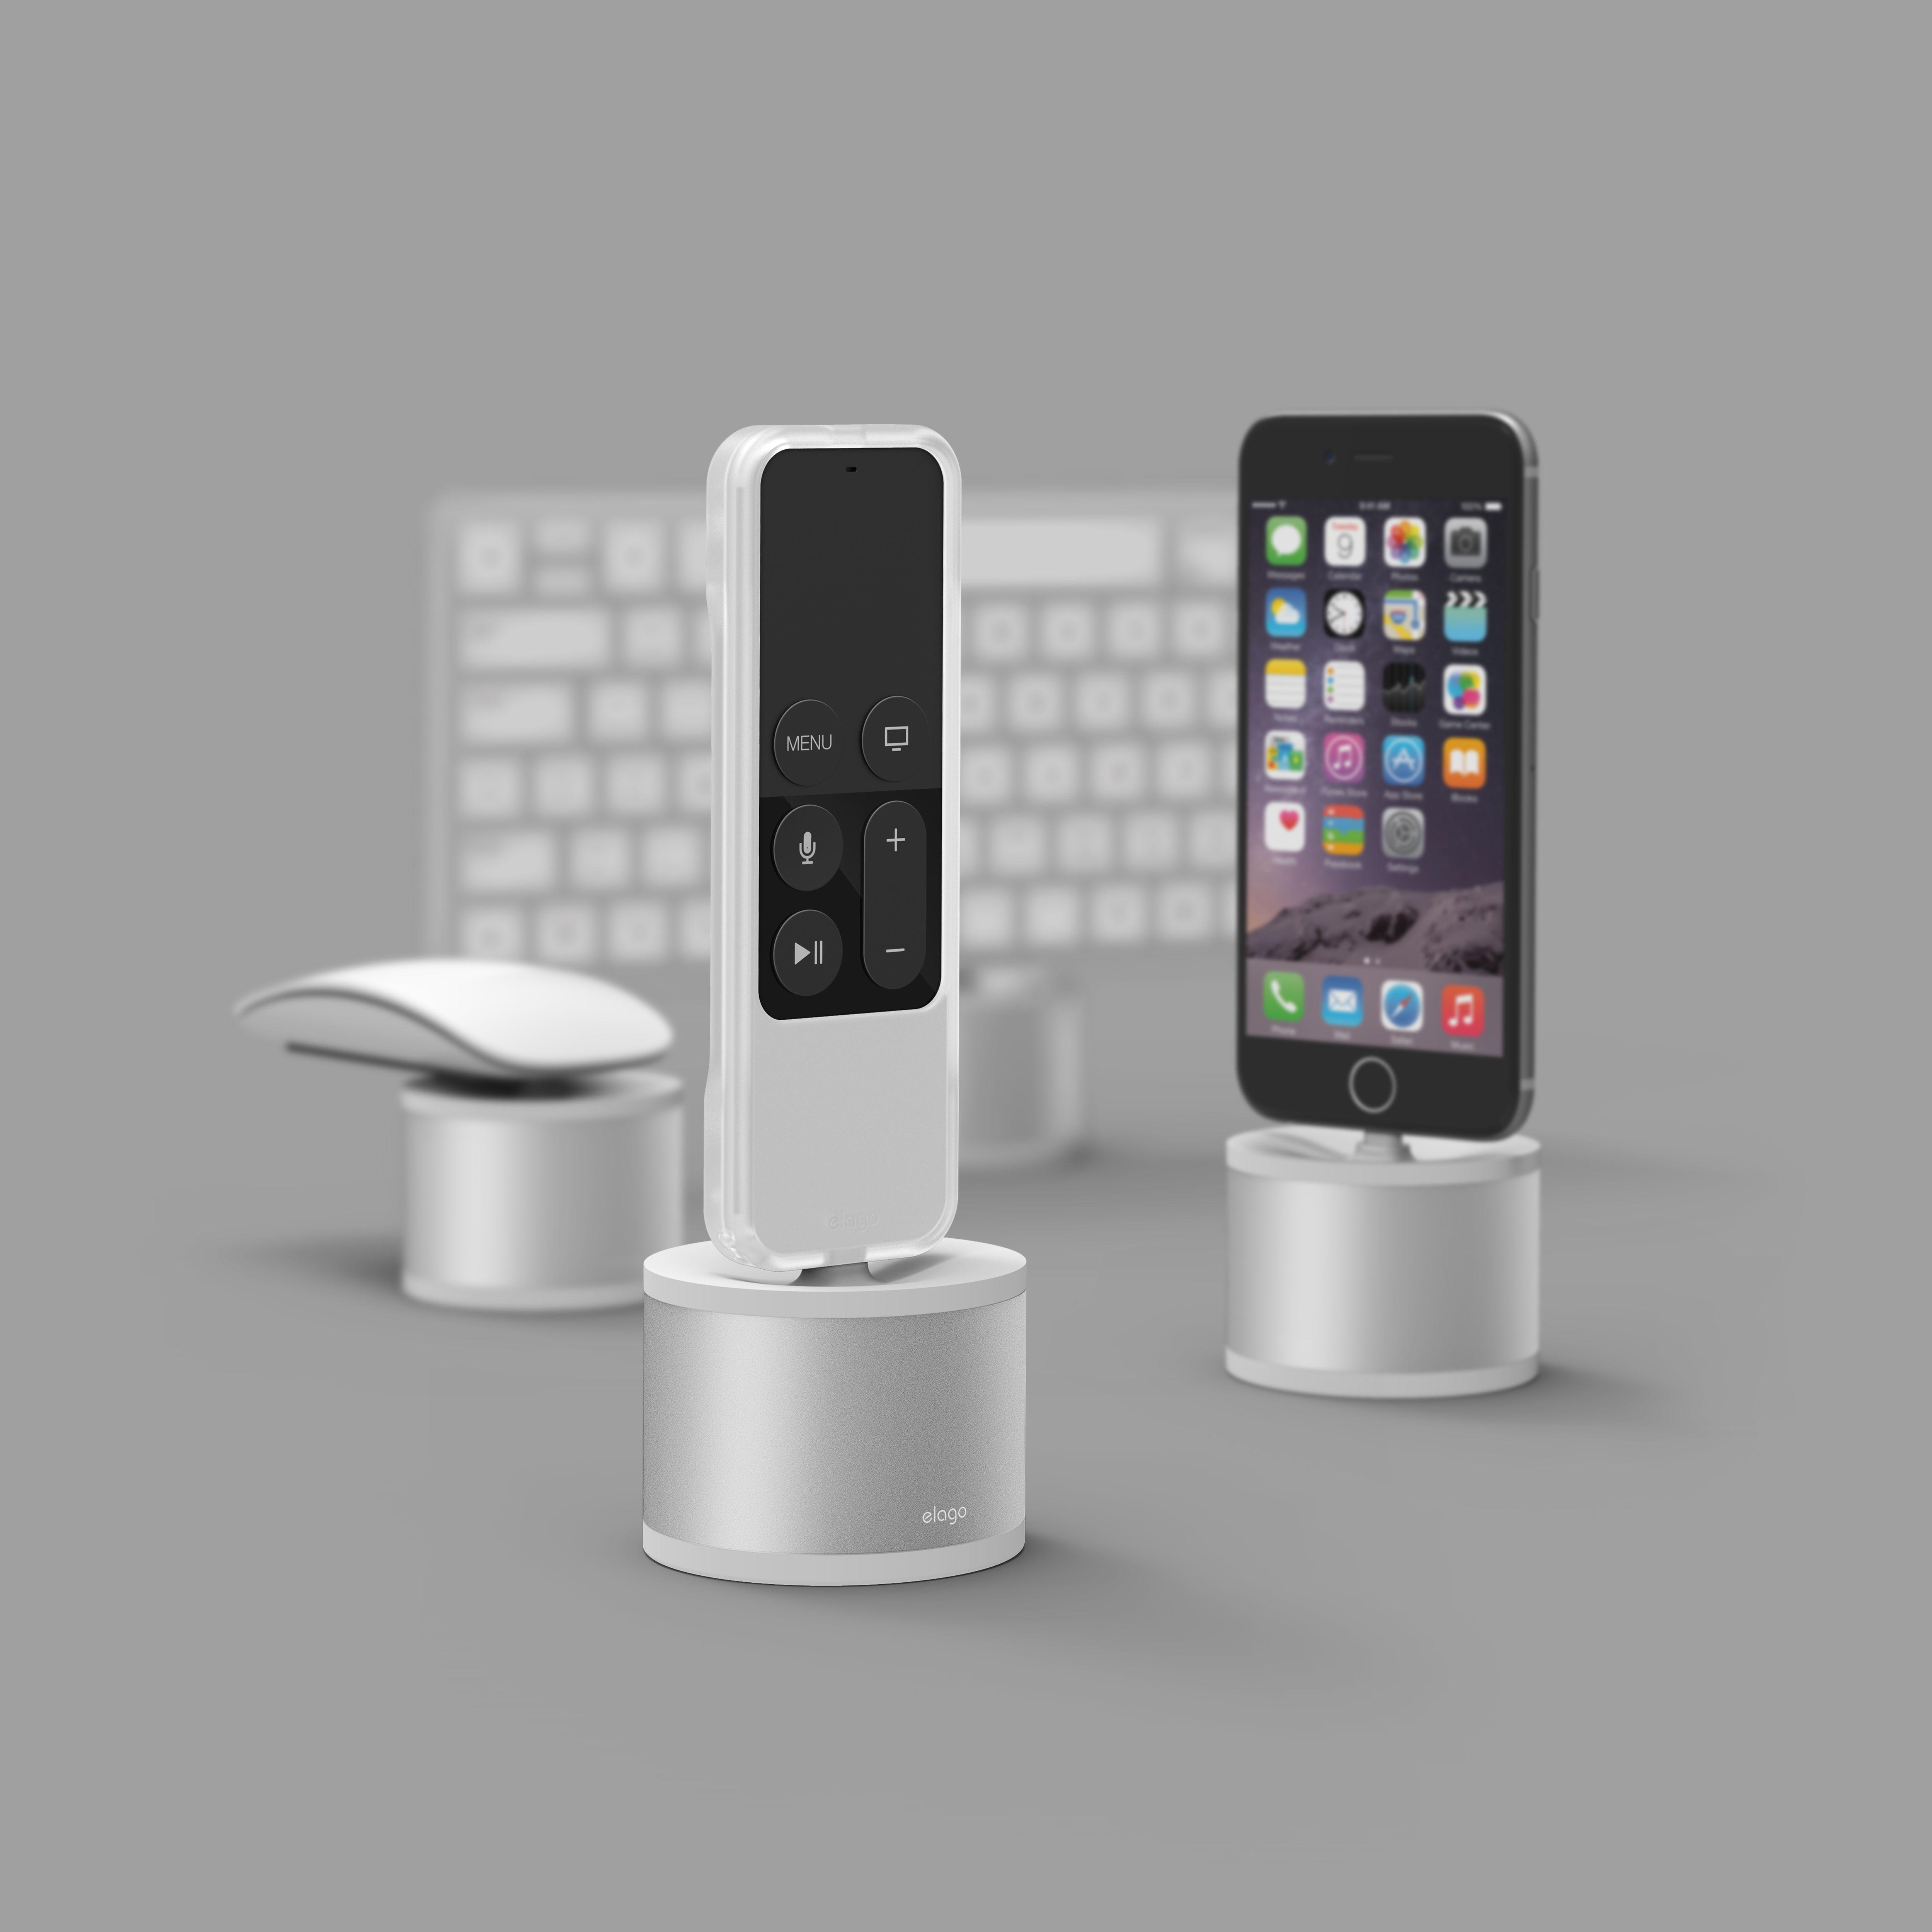 Ipad 2010 work red dot award product design - Product Design